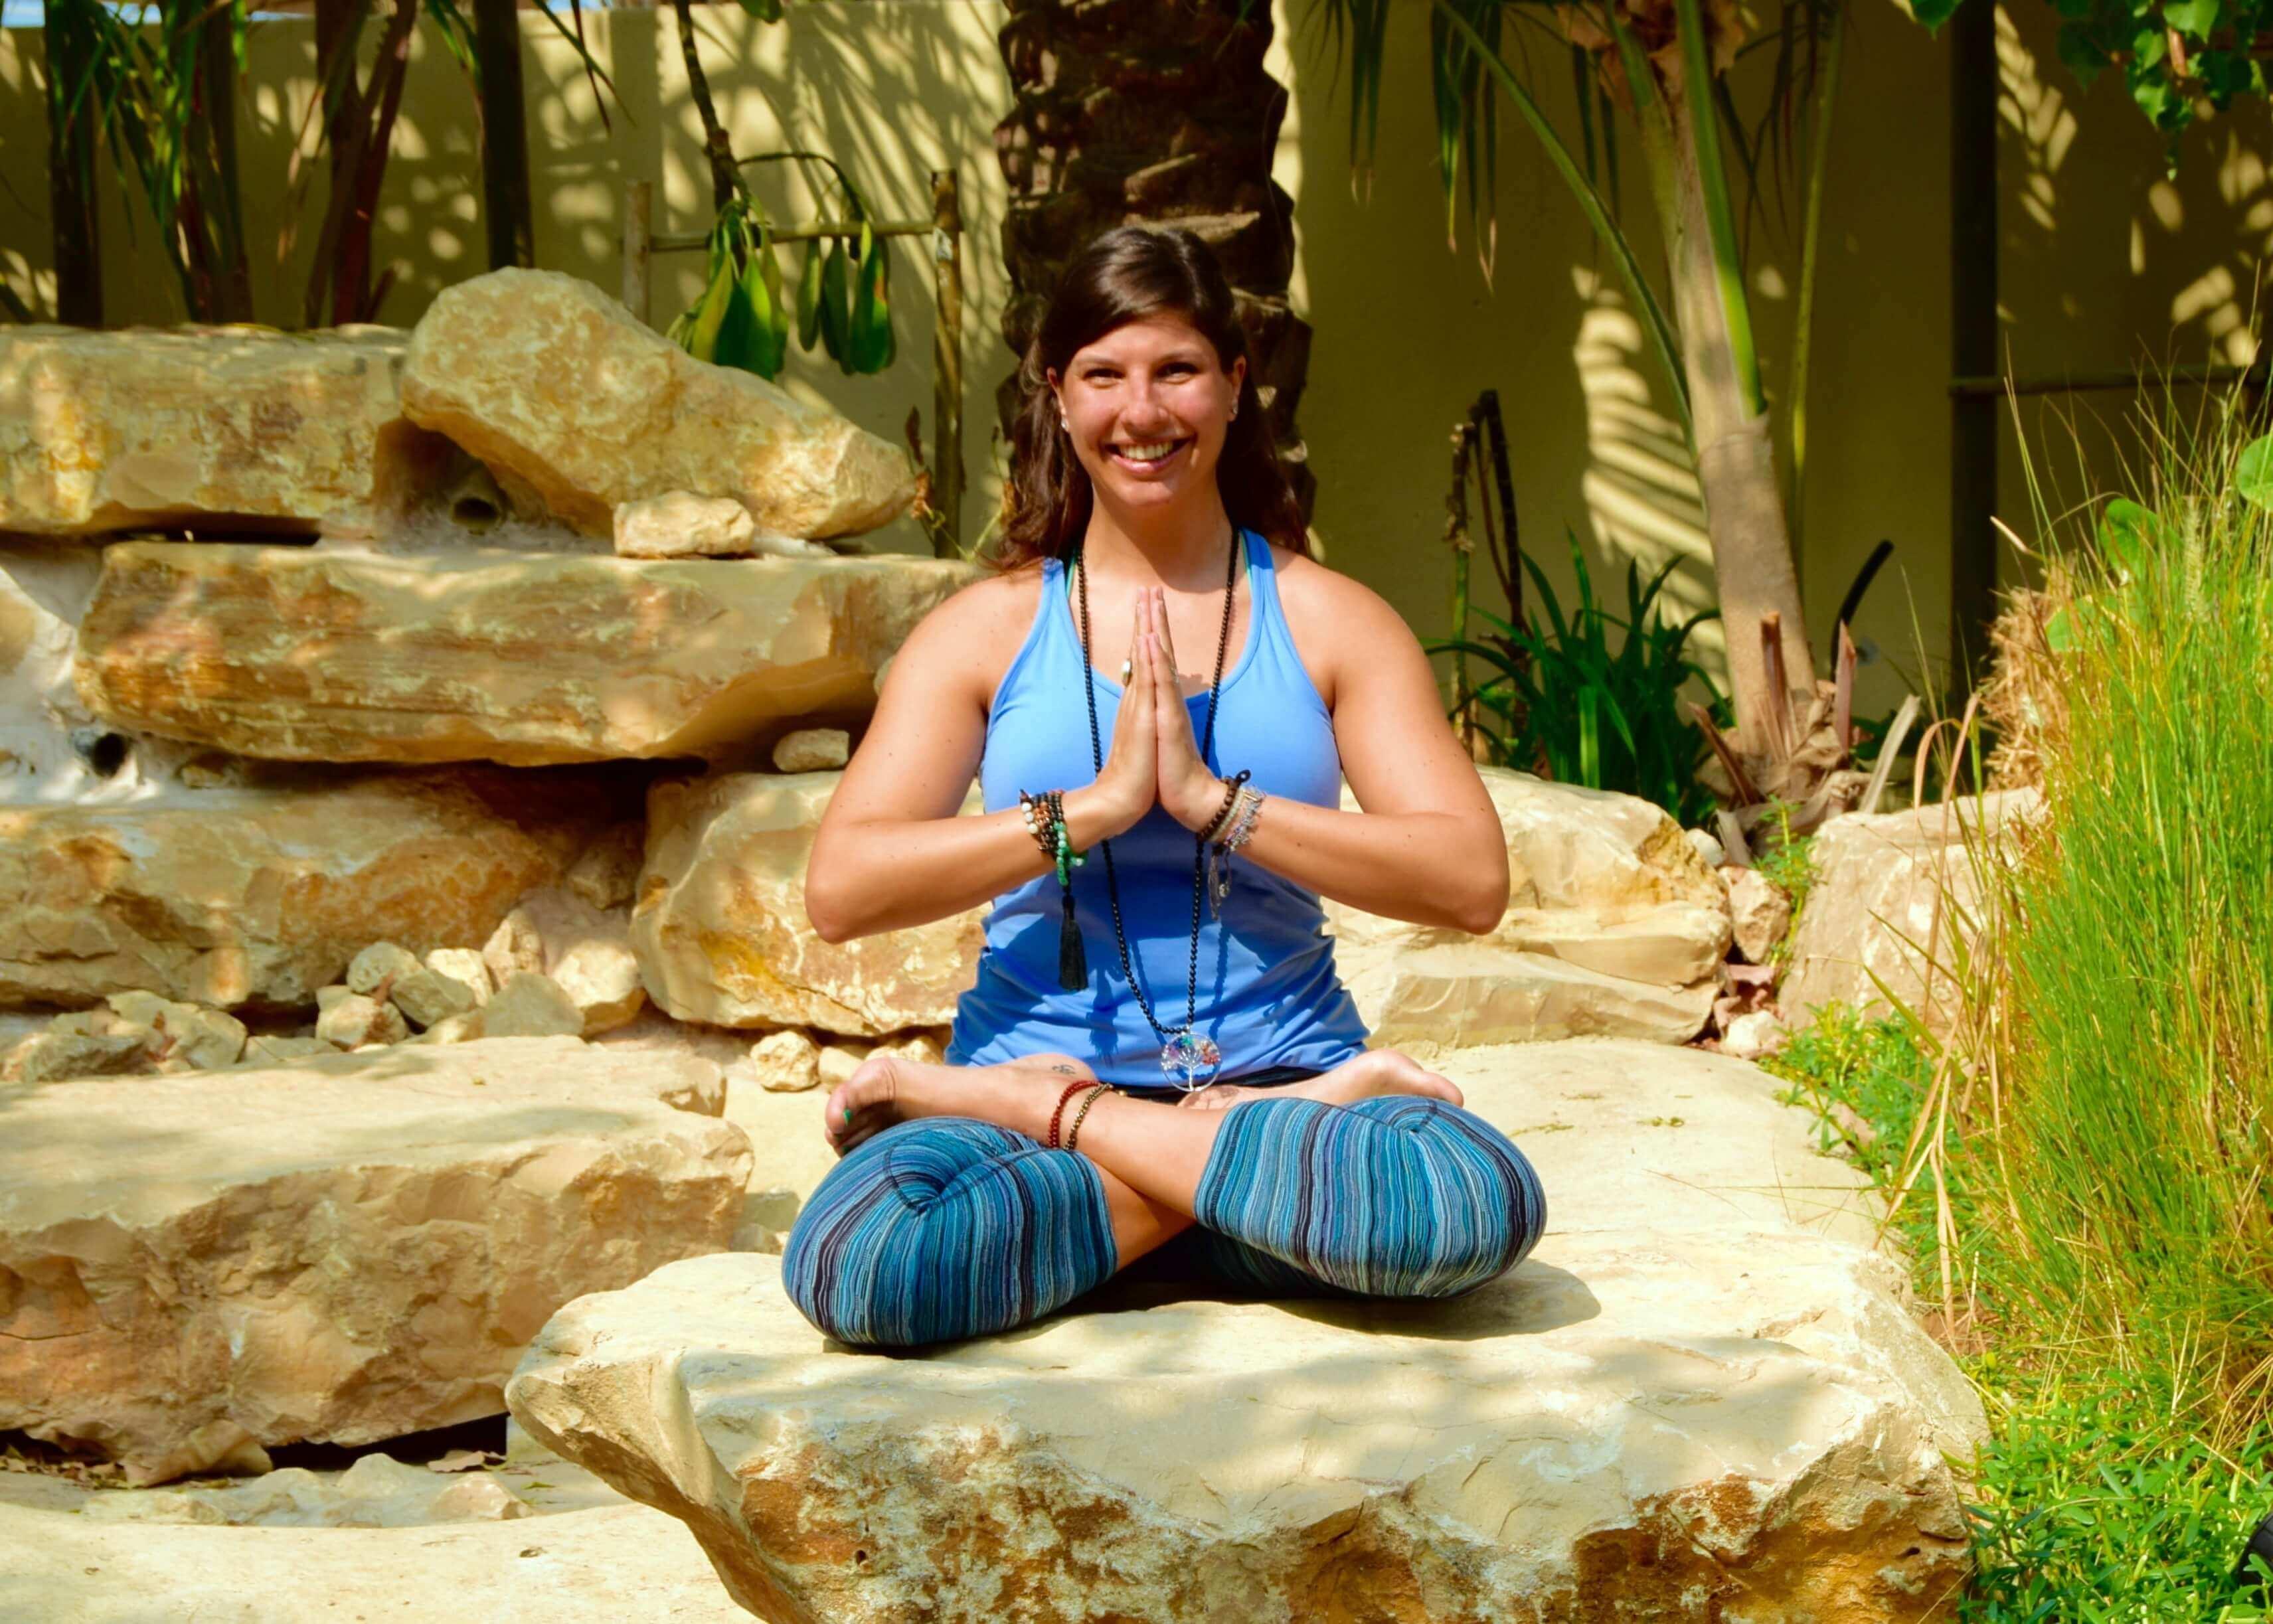 Chiara Galli is a RYT200 vinyasa yoga teacher